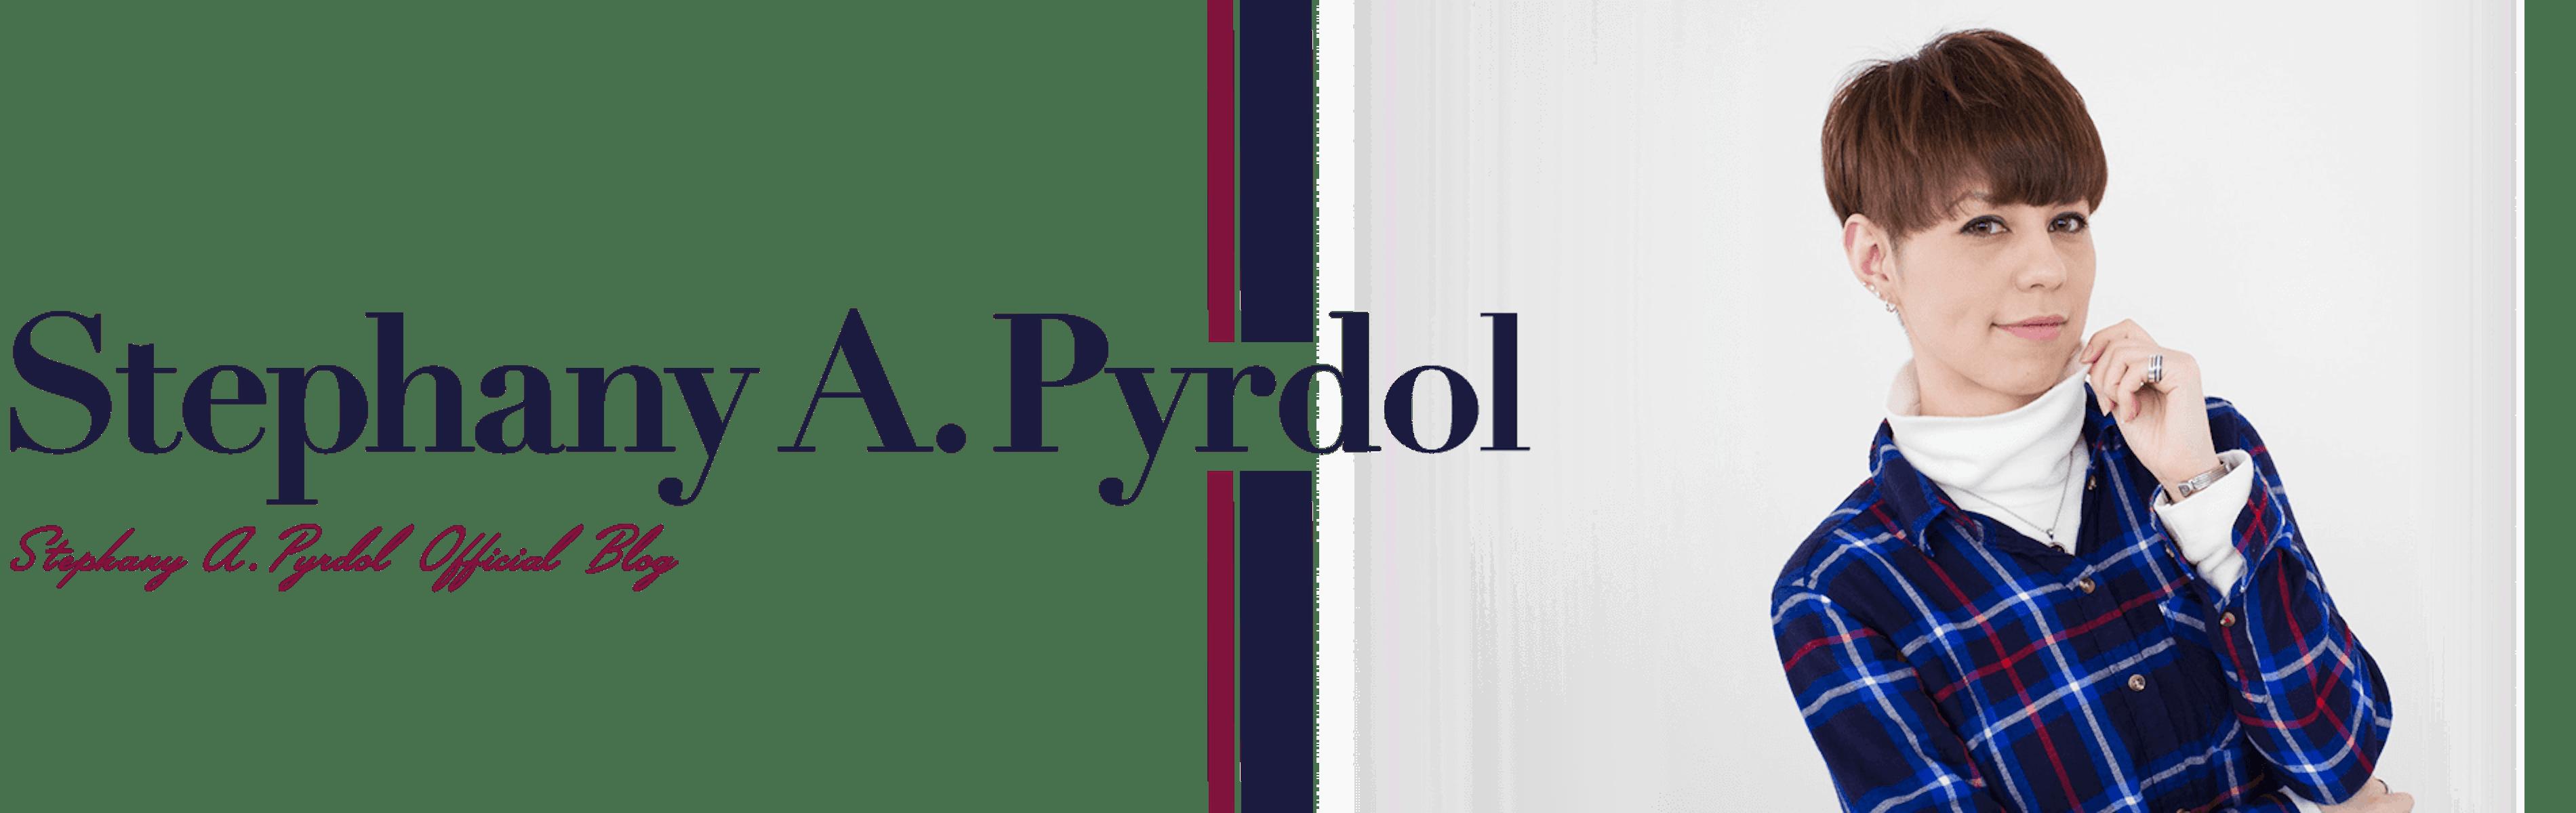 Stephany A. Pyrdol オフィシャルブログ